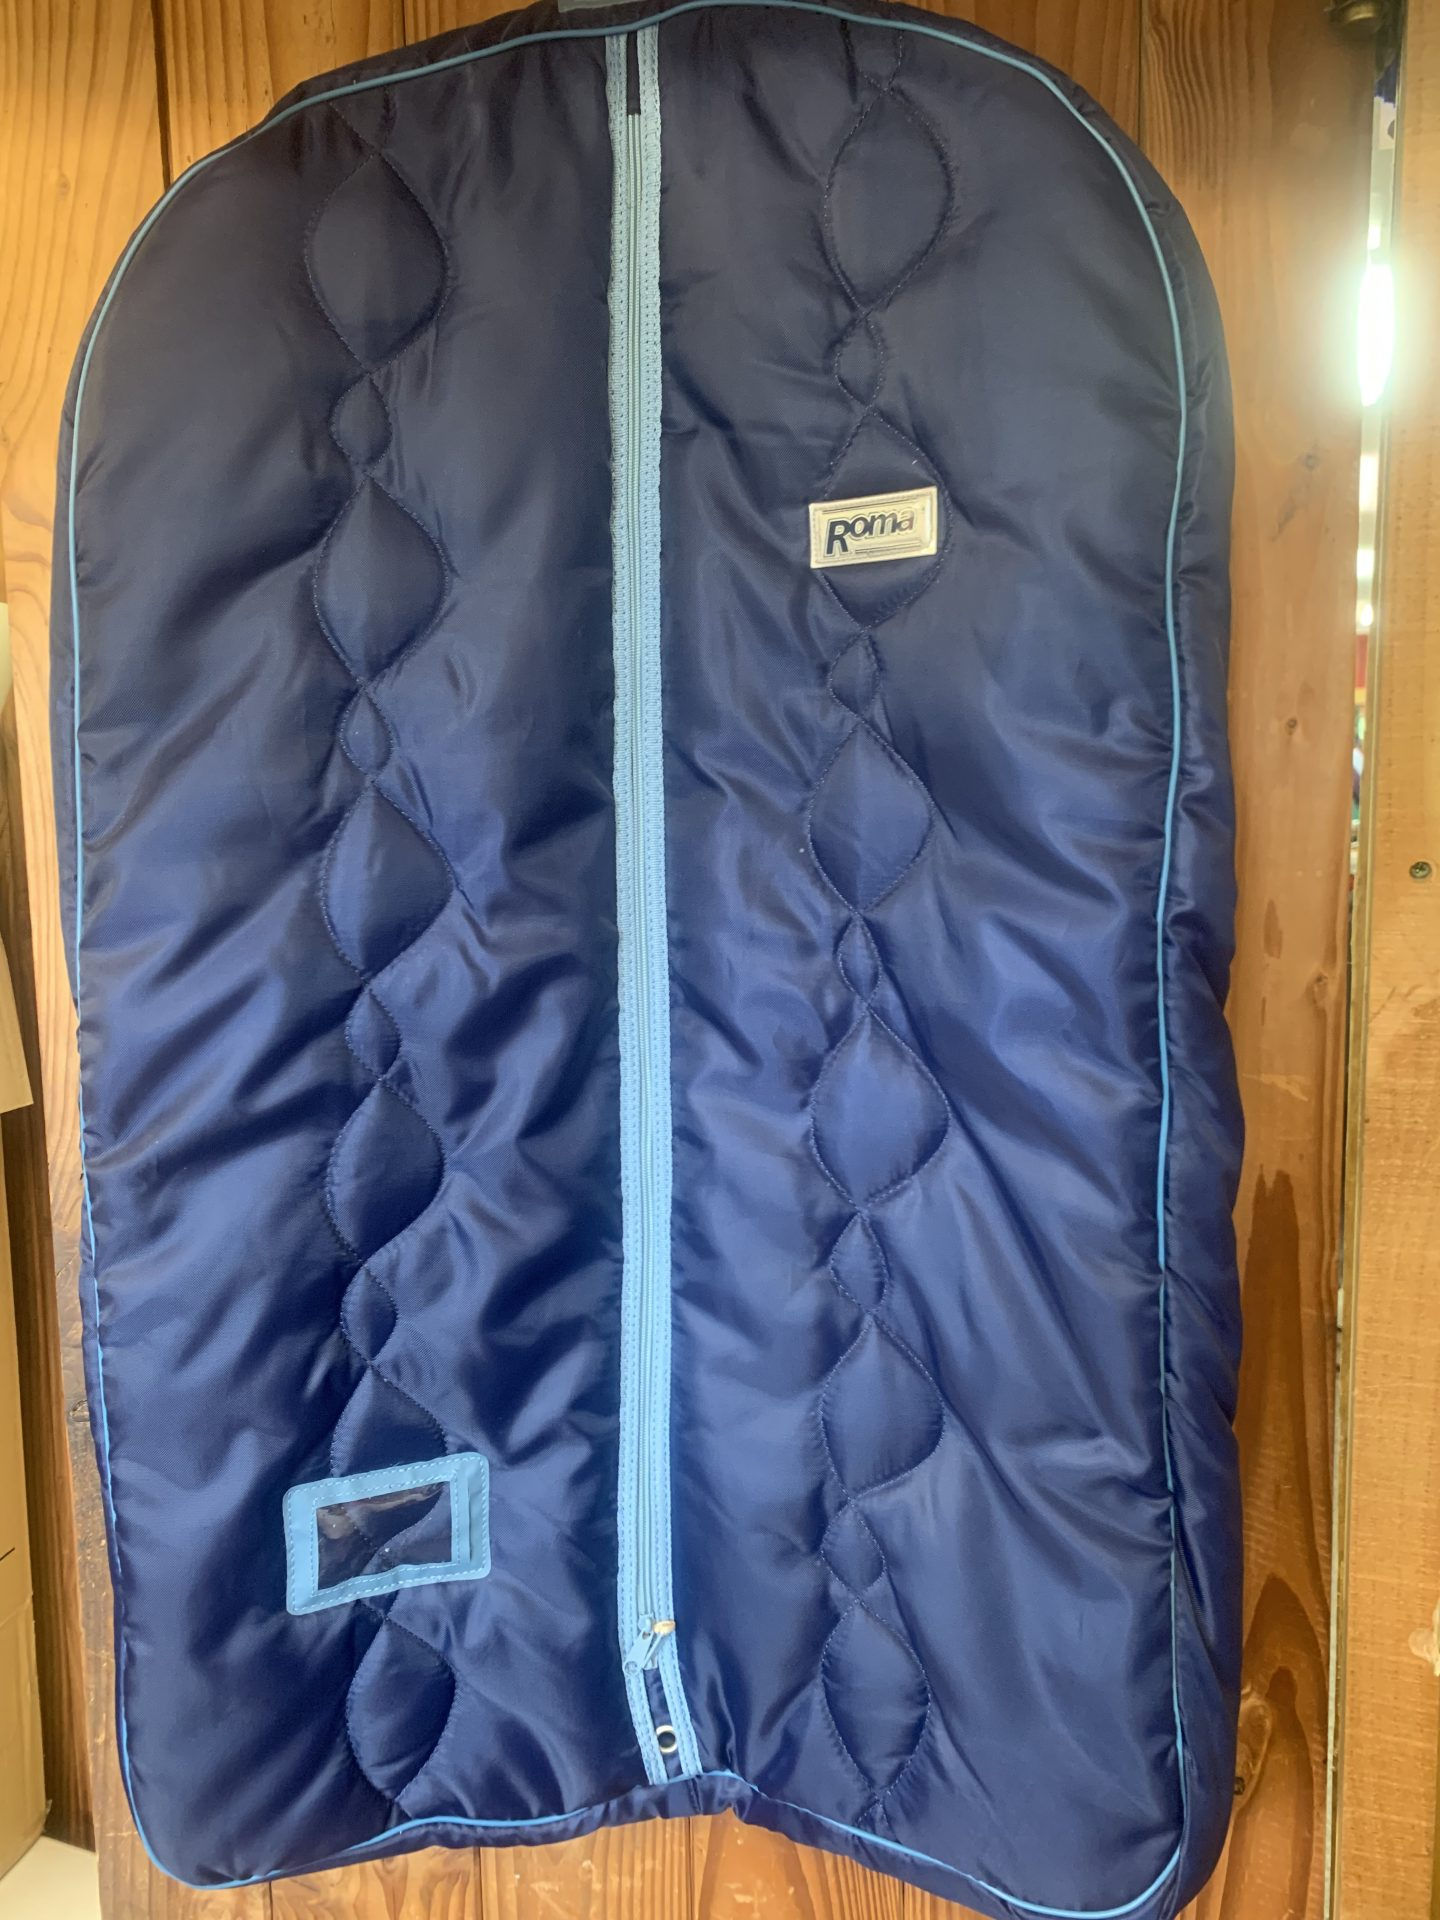 Roma Jacket Bag